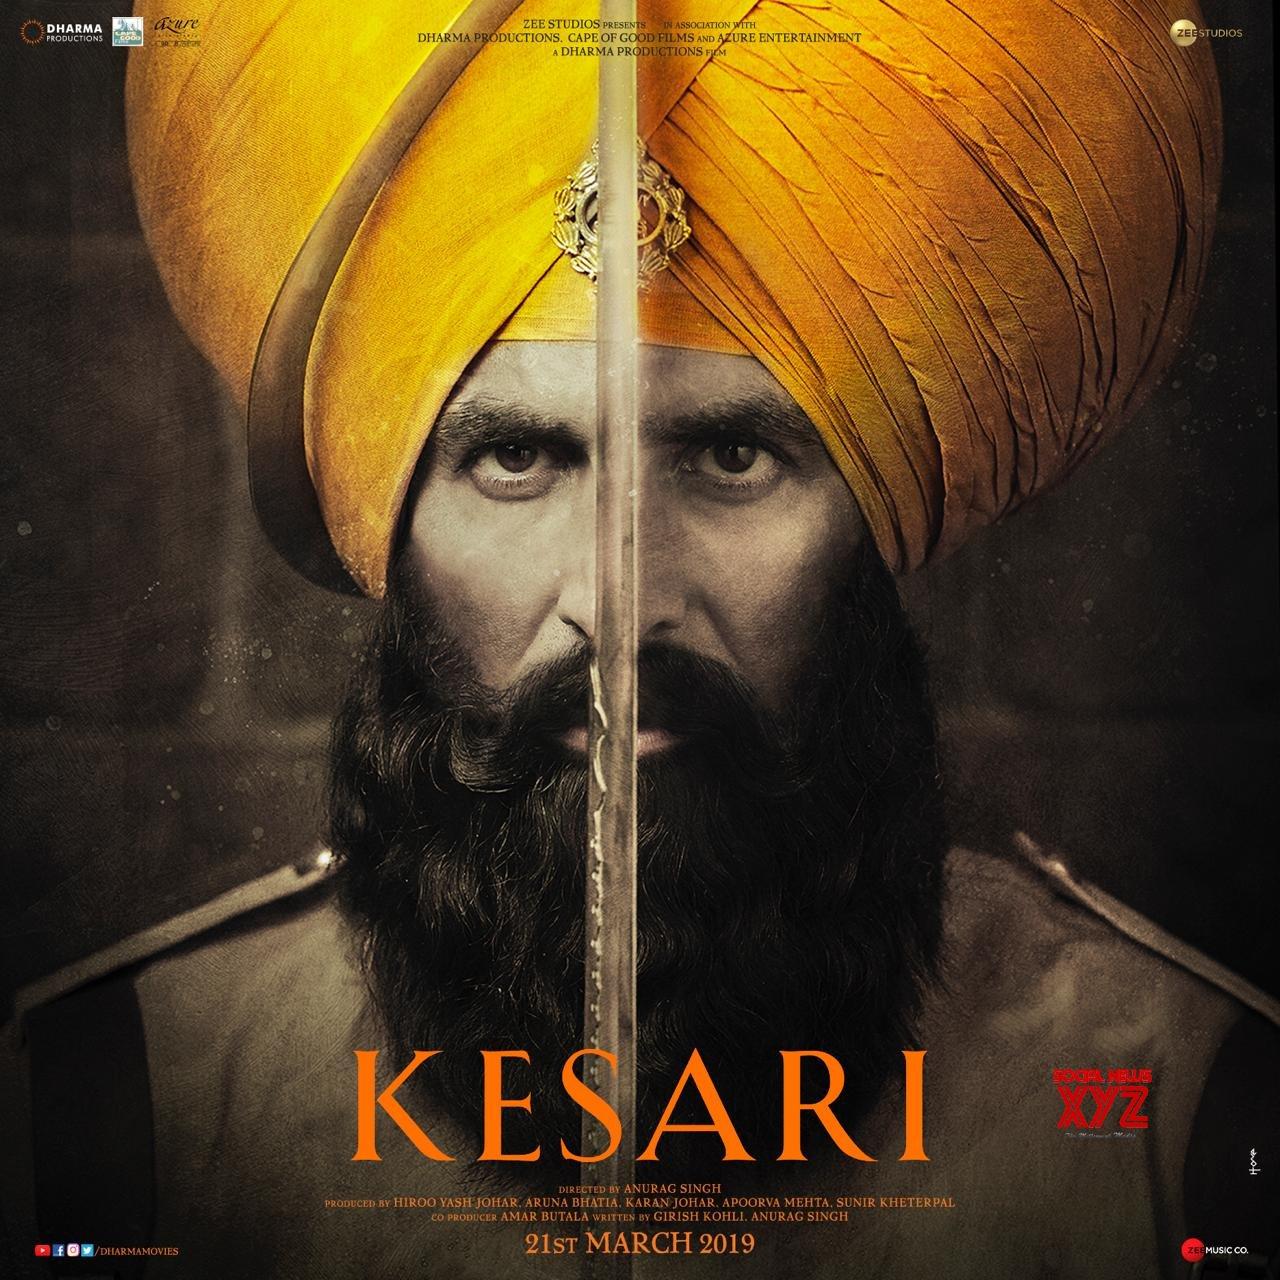 Akshay Kumar's Kesari Movie New Poster